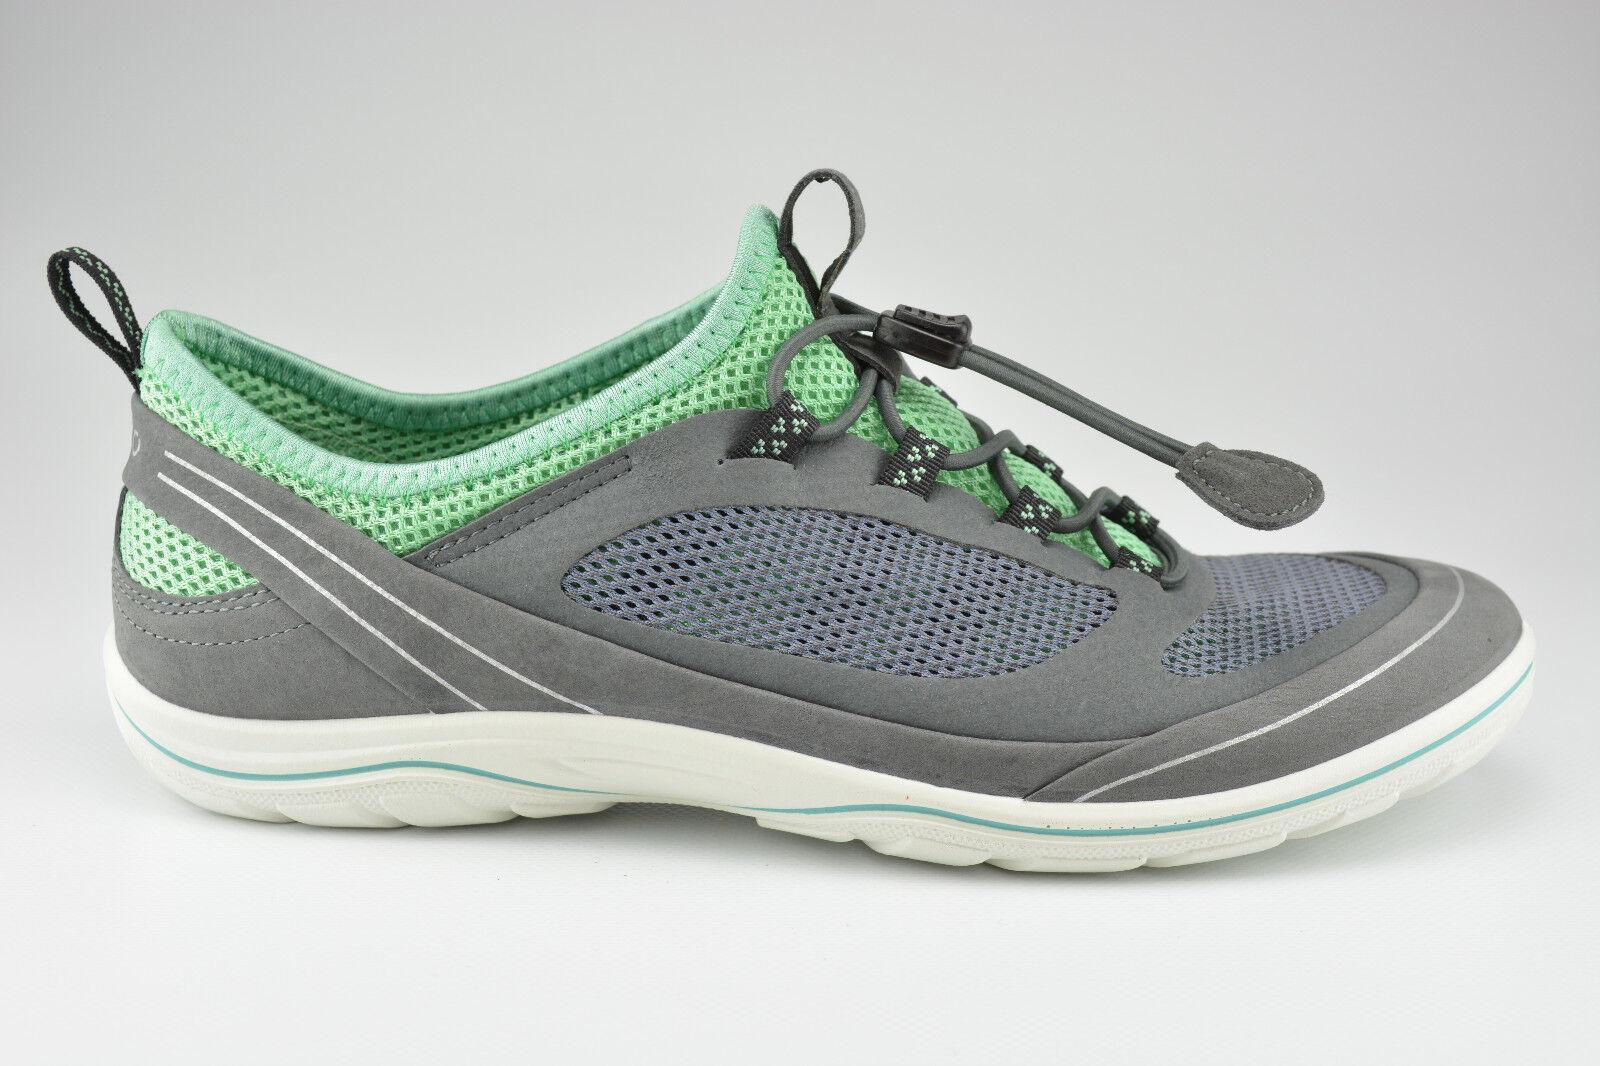 Ecco Schuhe grün Damen Schnürer Echtleder Nubukleder Arizona grau grün Schuhe 3d84bc